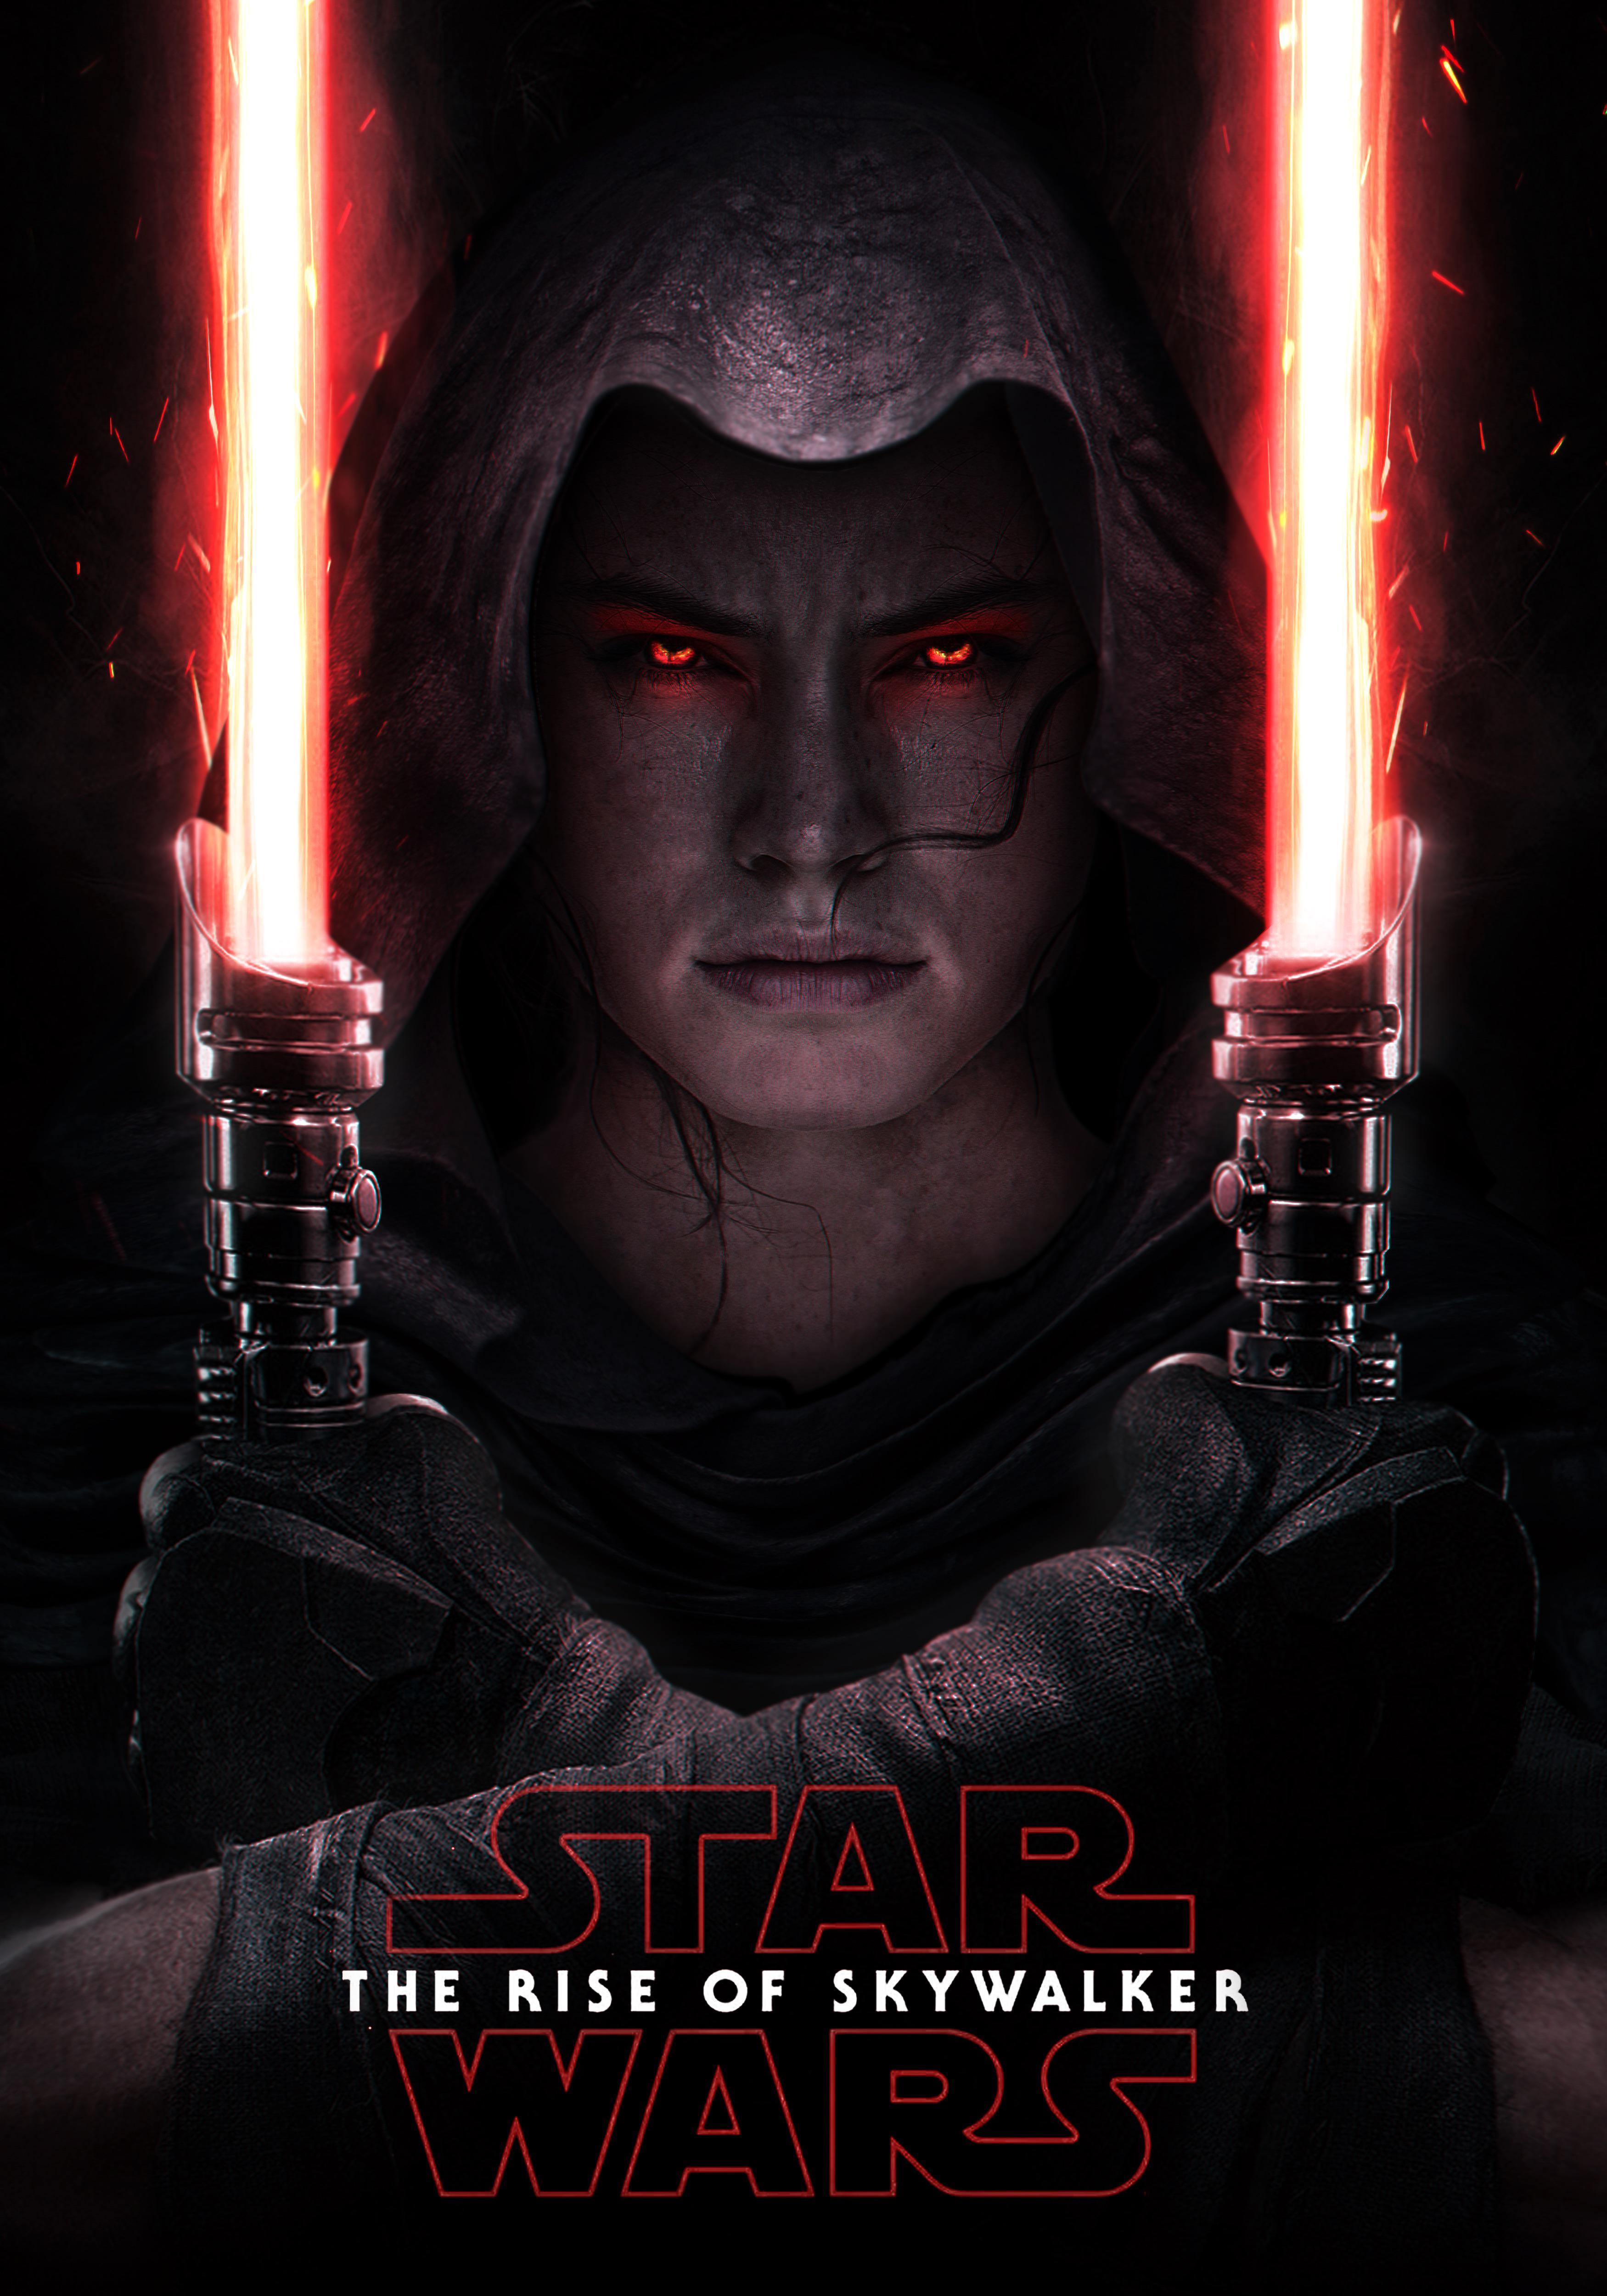 Star Wars The Rise Of Skywalker 4k Wallpaper Rey Daisy Ridley Lightsaber Movies 997